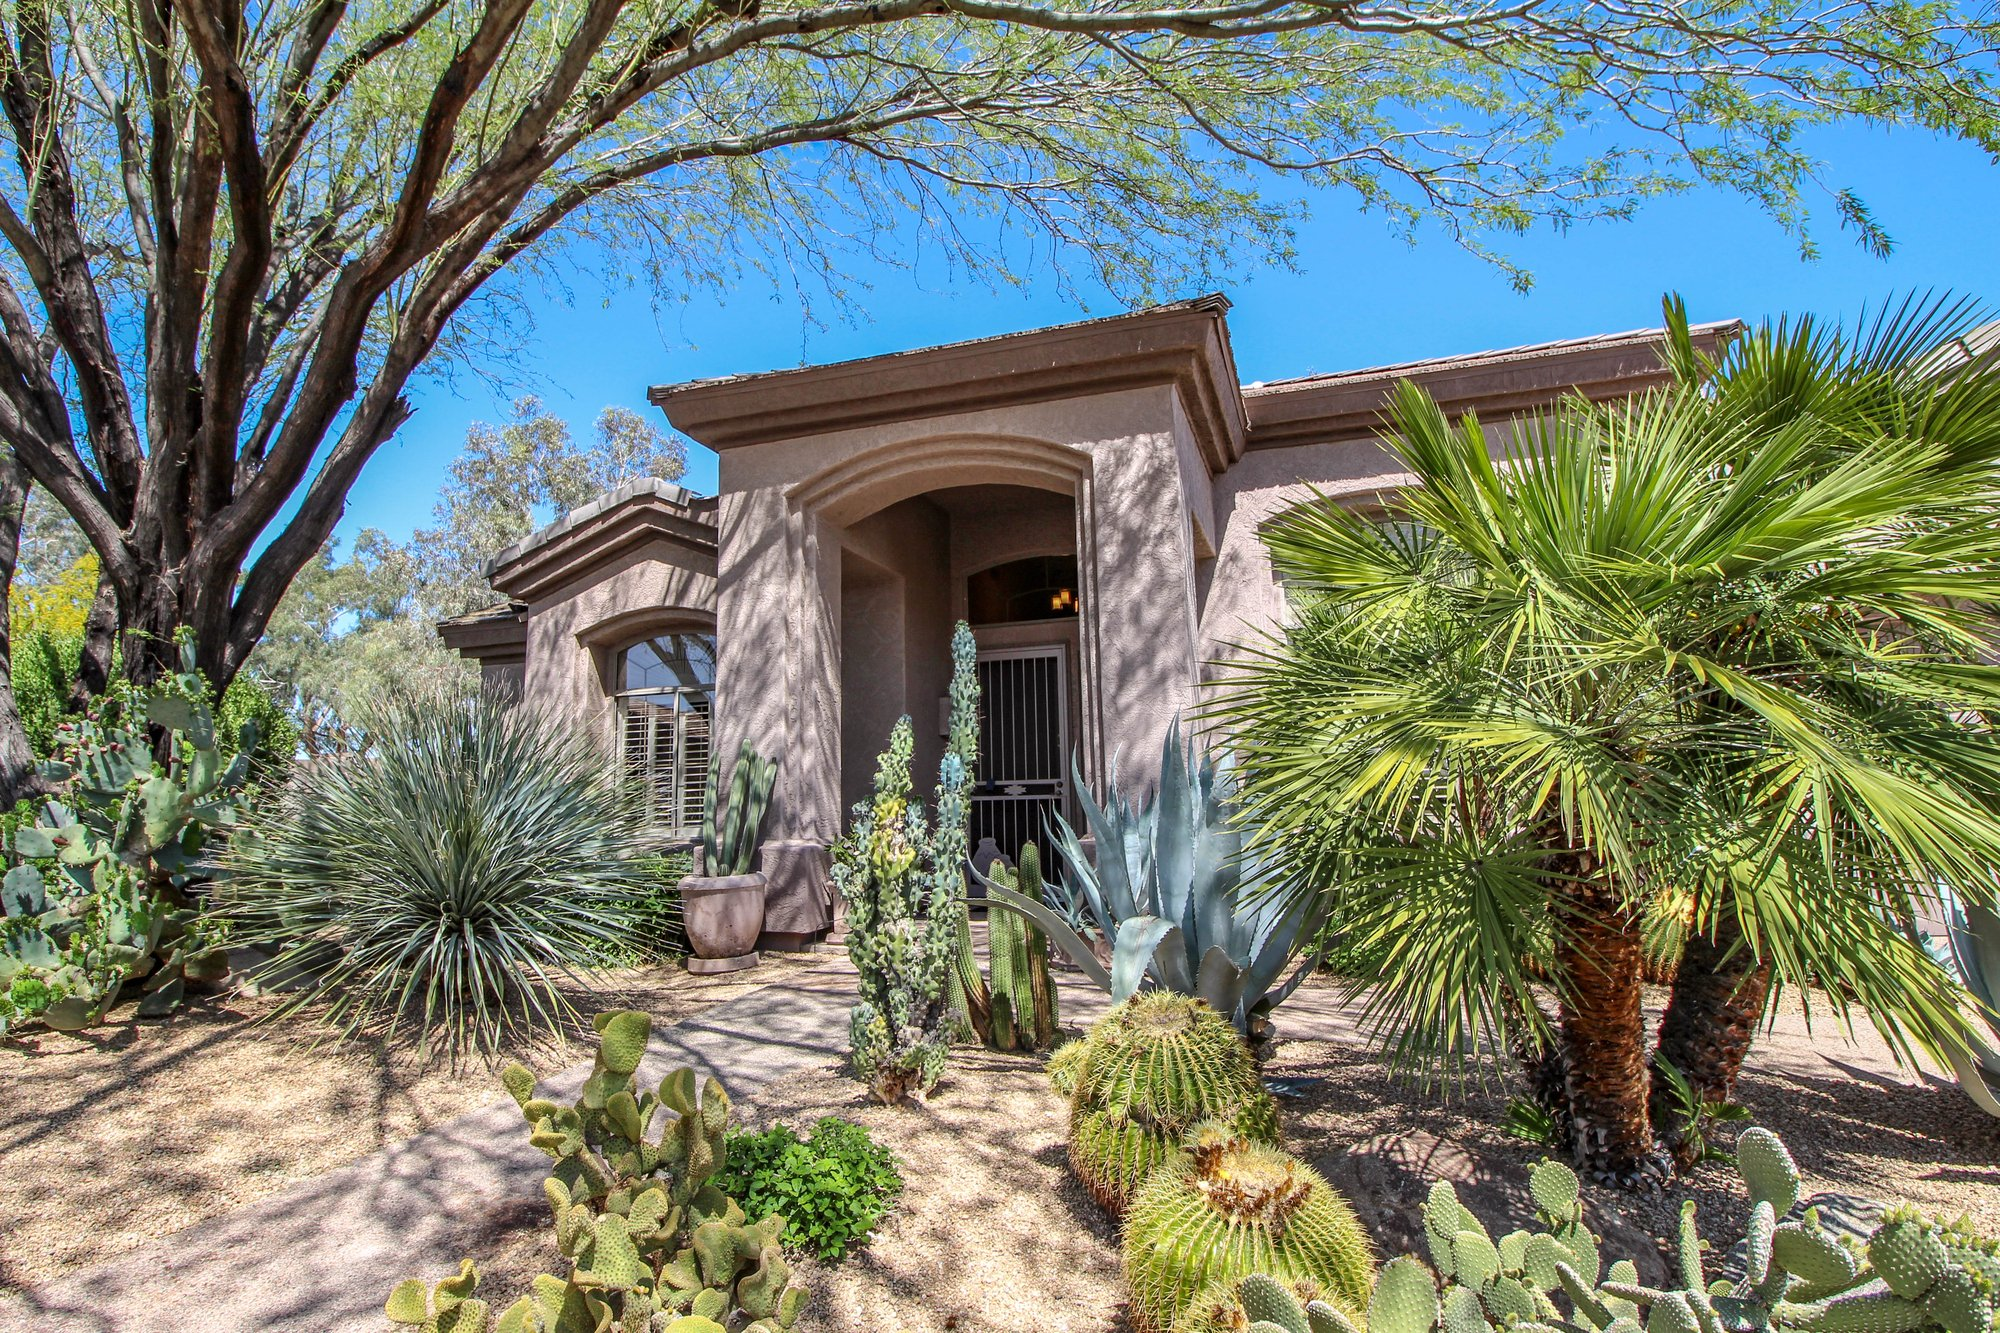 Where to buy new home windows in Arizona